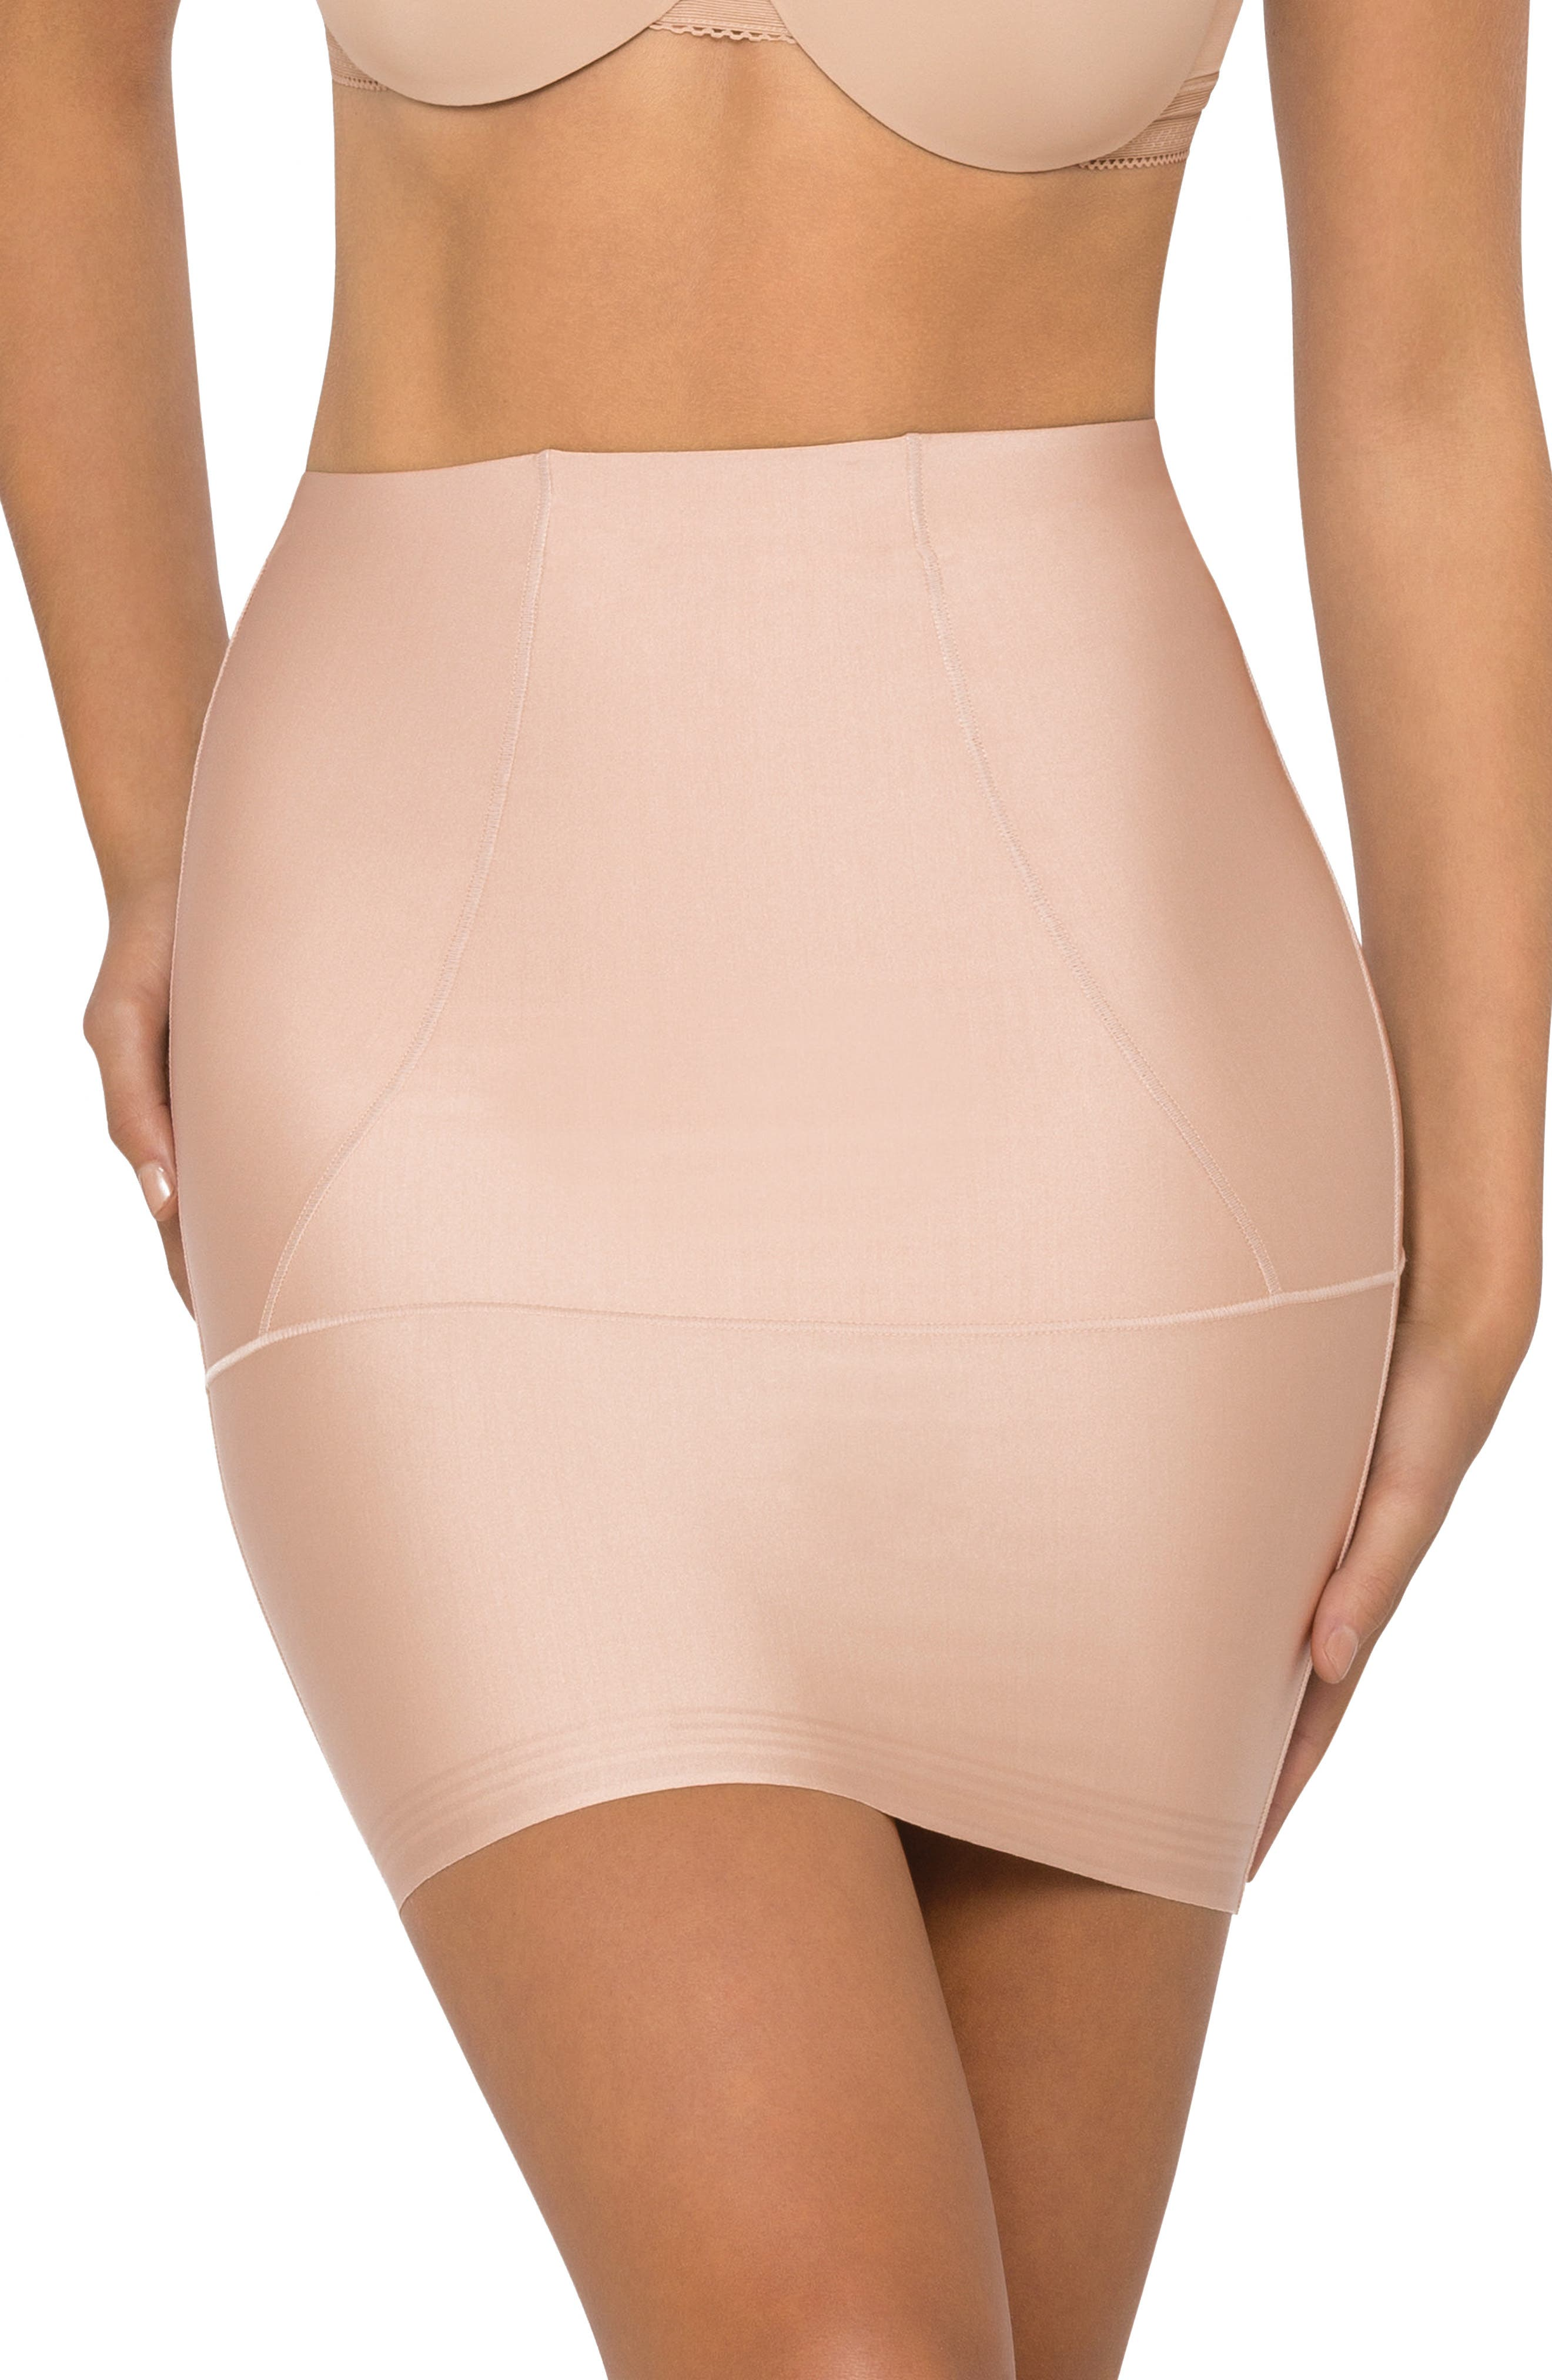 Body Architect Shaper Slip Skirt, Warm Taupe